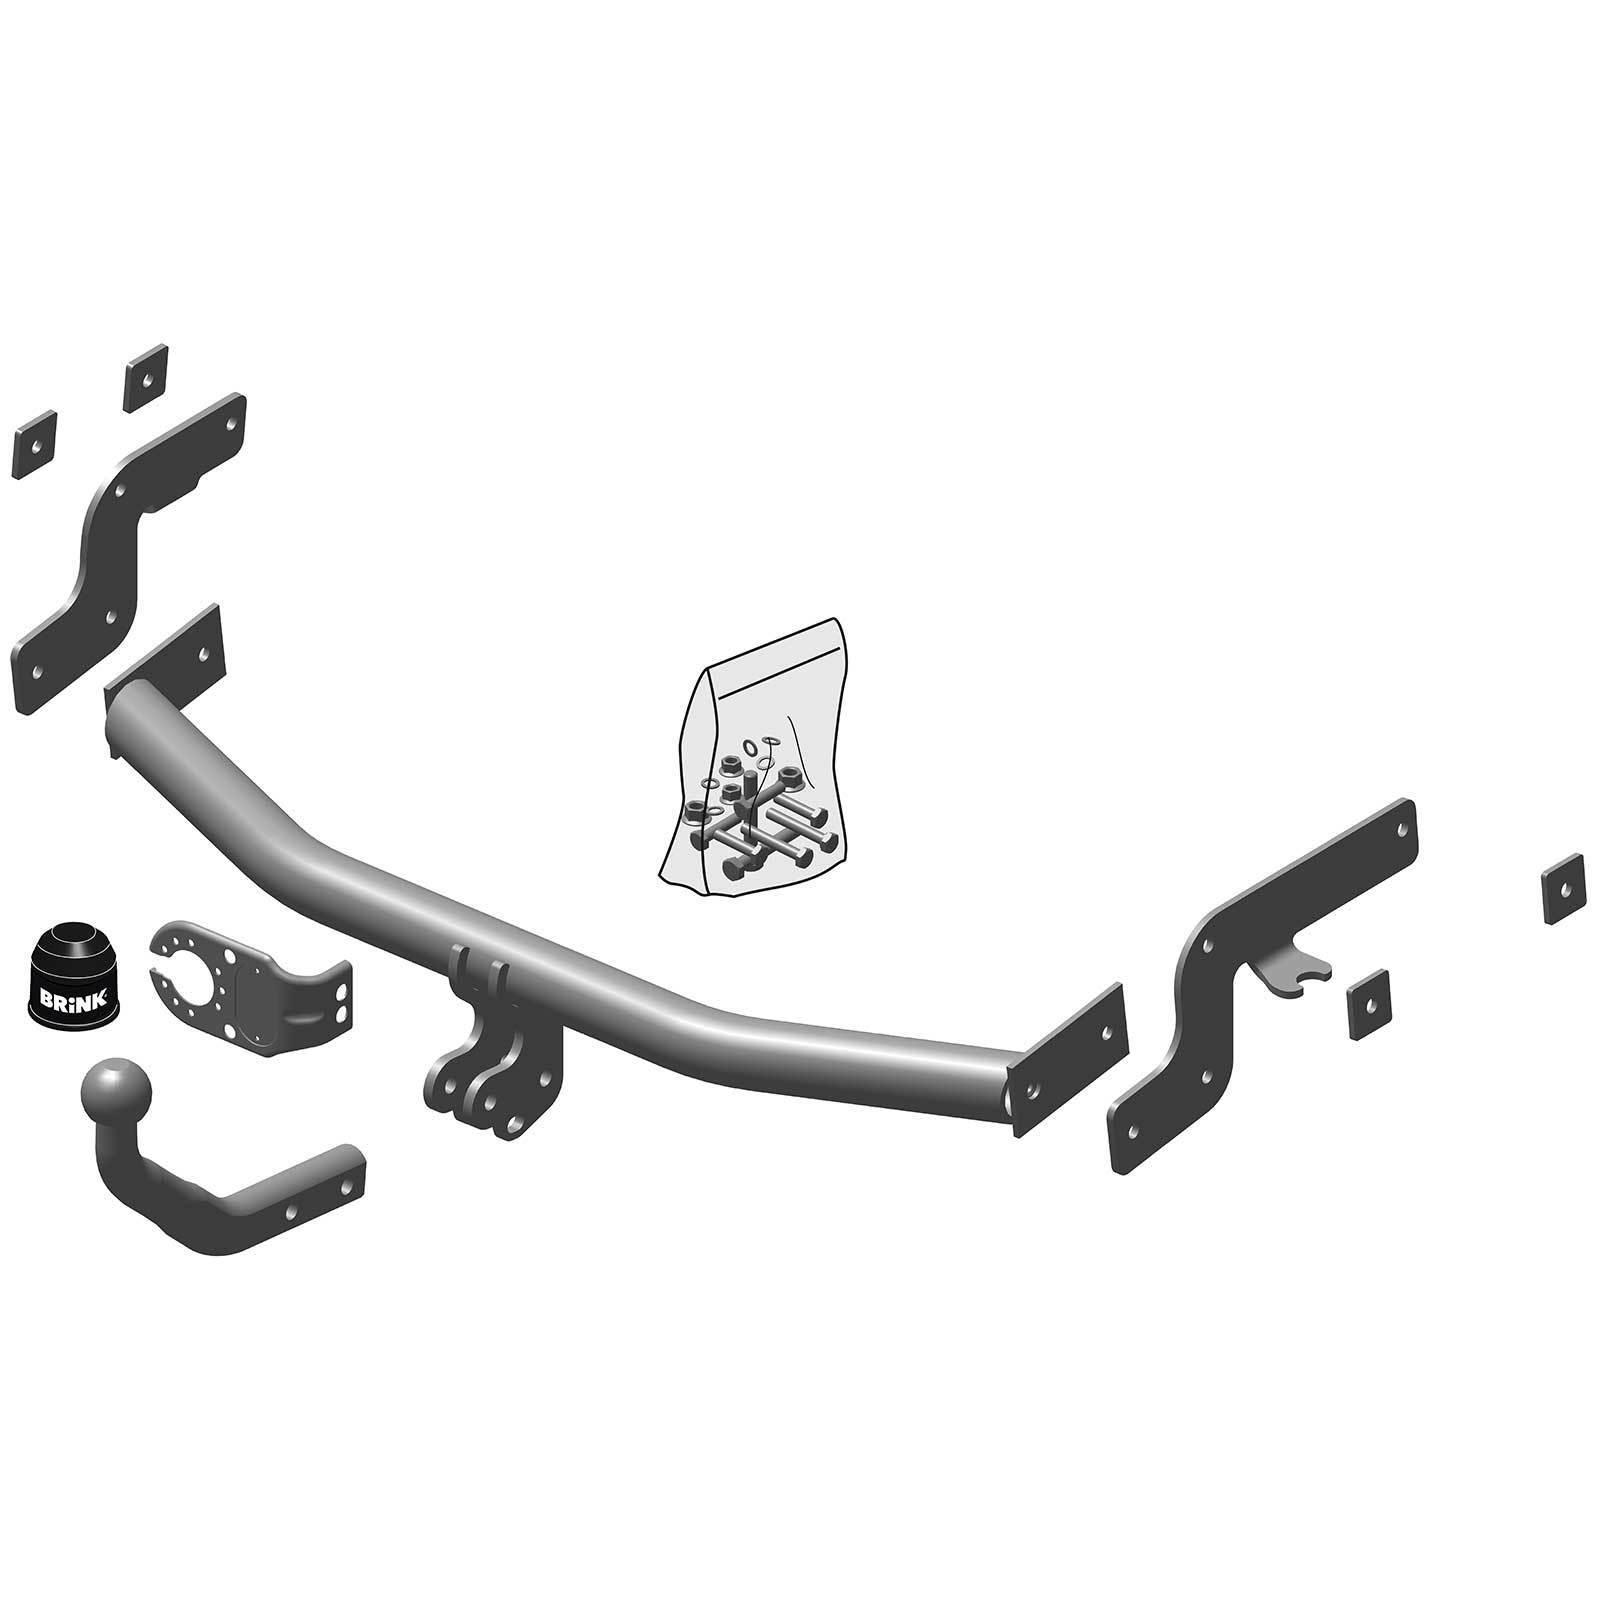 Tow Bar 13152//F/_B1 Fixed Swan Neck Towbar For Citroën Nemo 7 Pin Electrics 2008